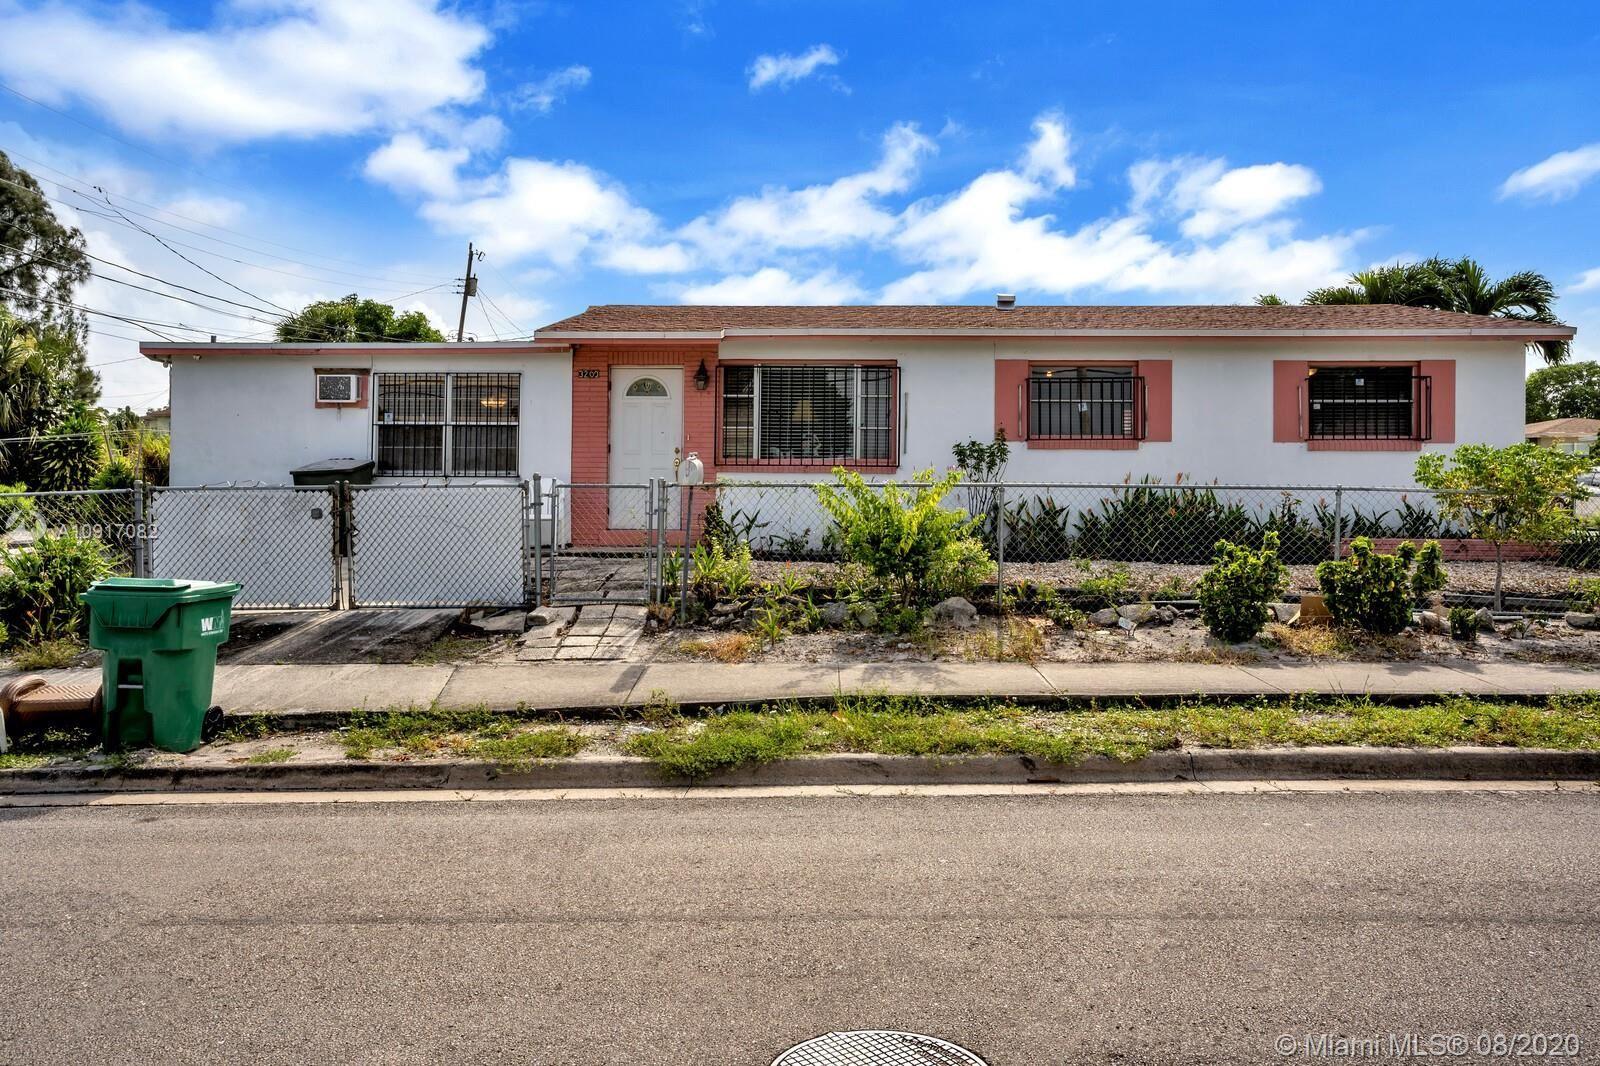 Photo of 3200 Avenue O, Riviera Beach, FL 33404 (MLS # A10917082)